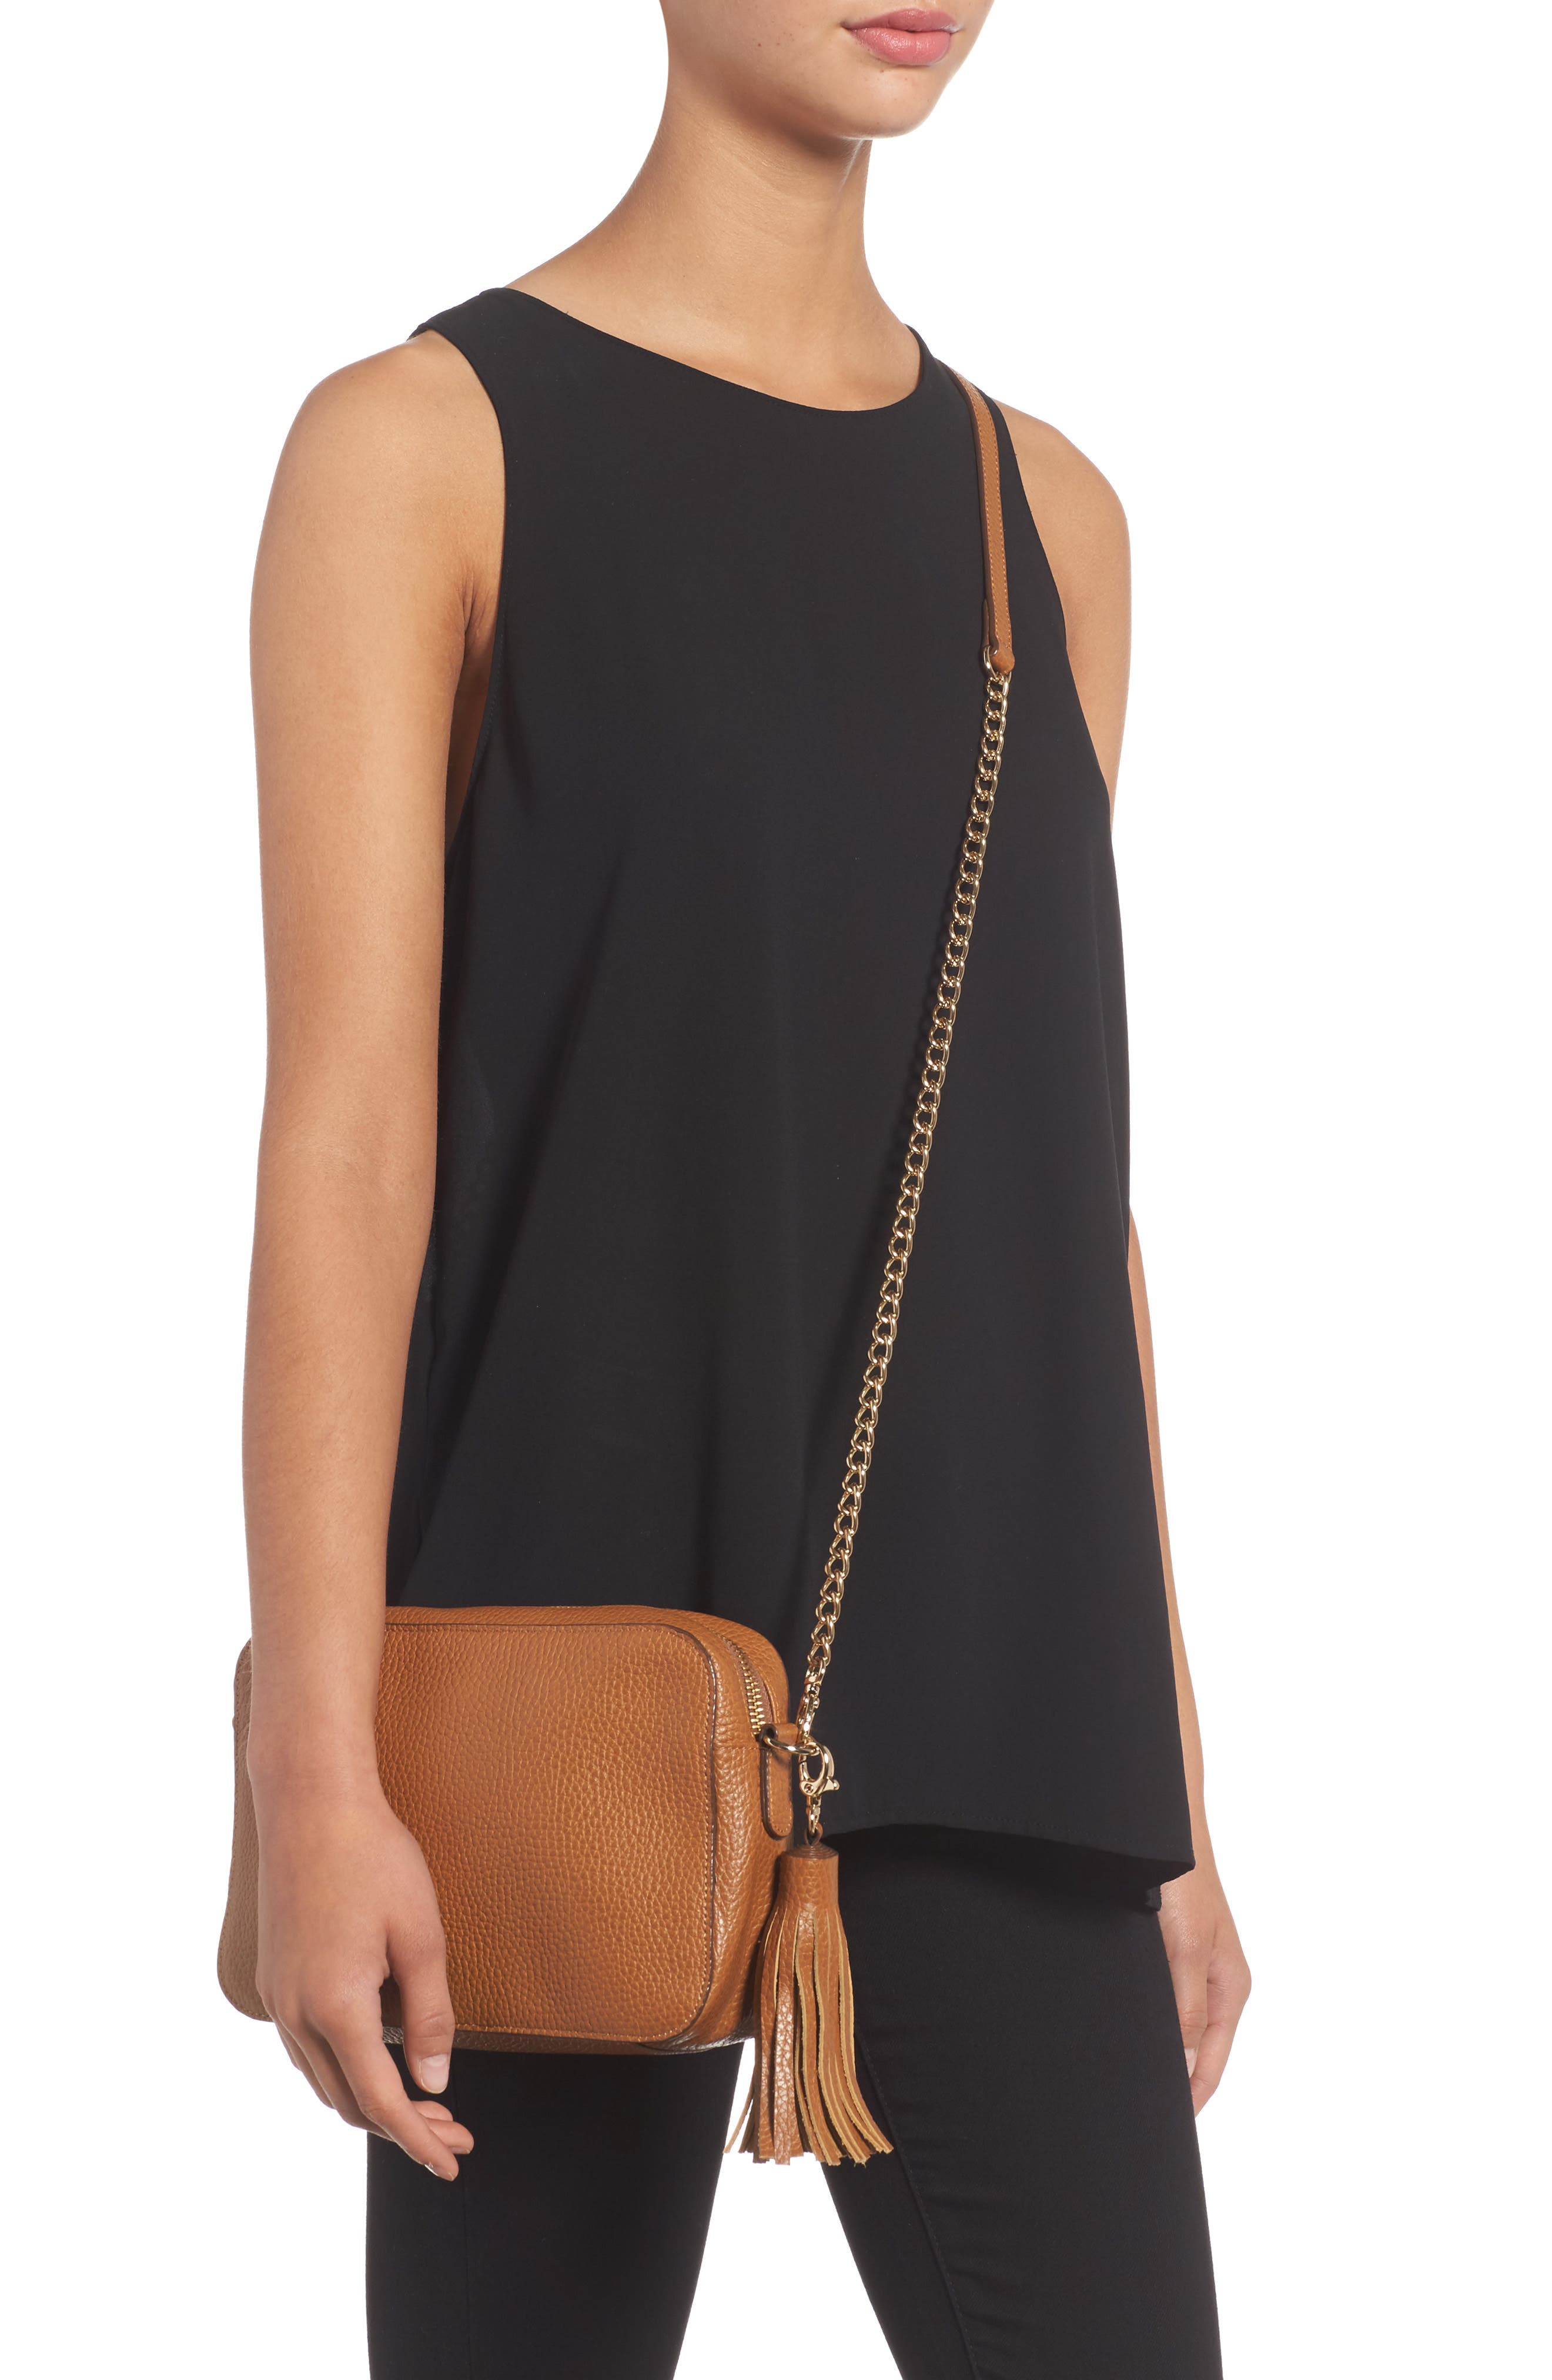 Ella Tassel Leather Crossbody Bag,                             Alternate thumbnail 2, color,                             Tan Spice